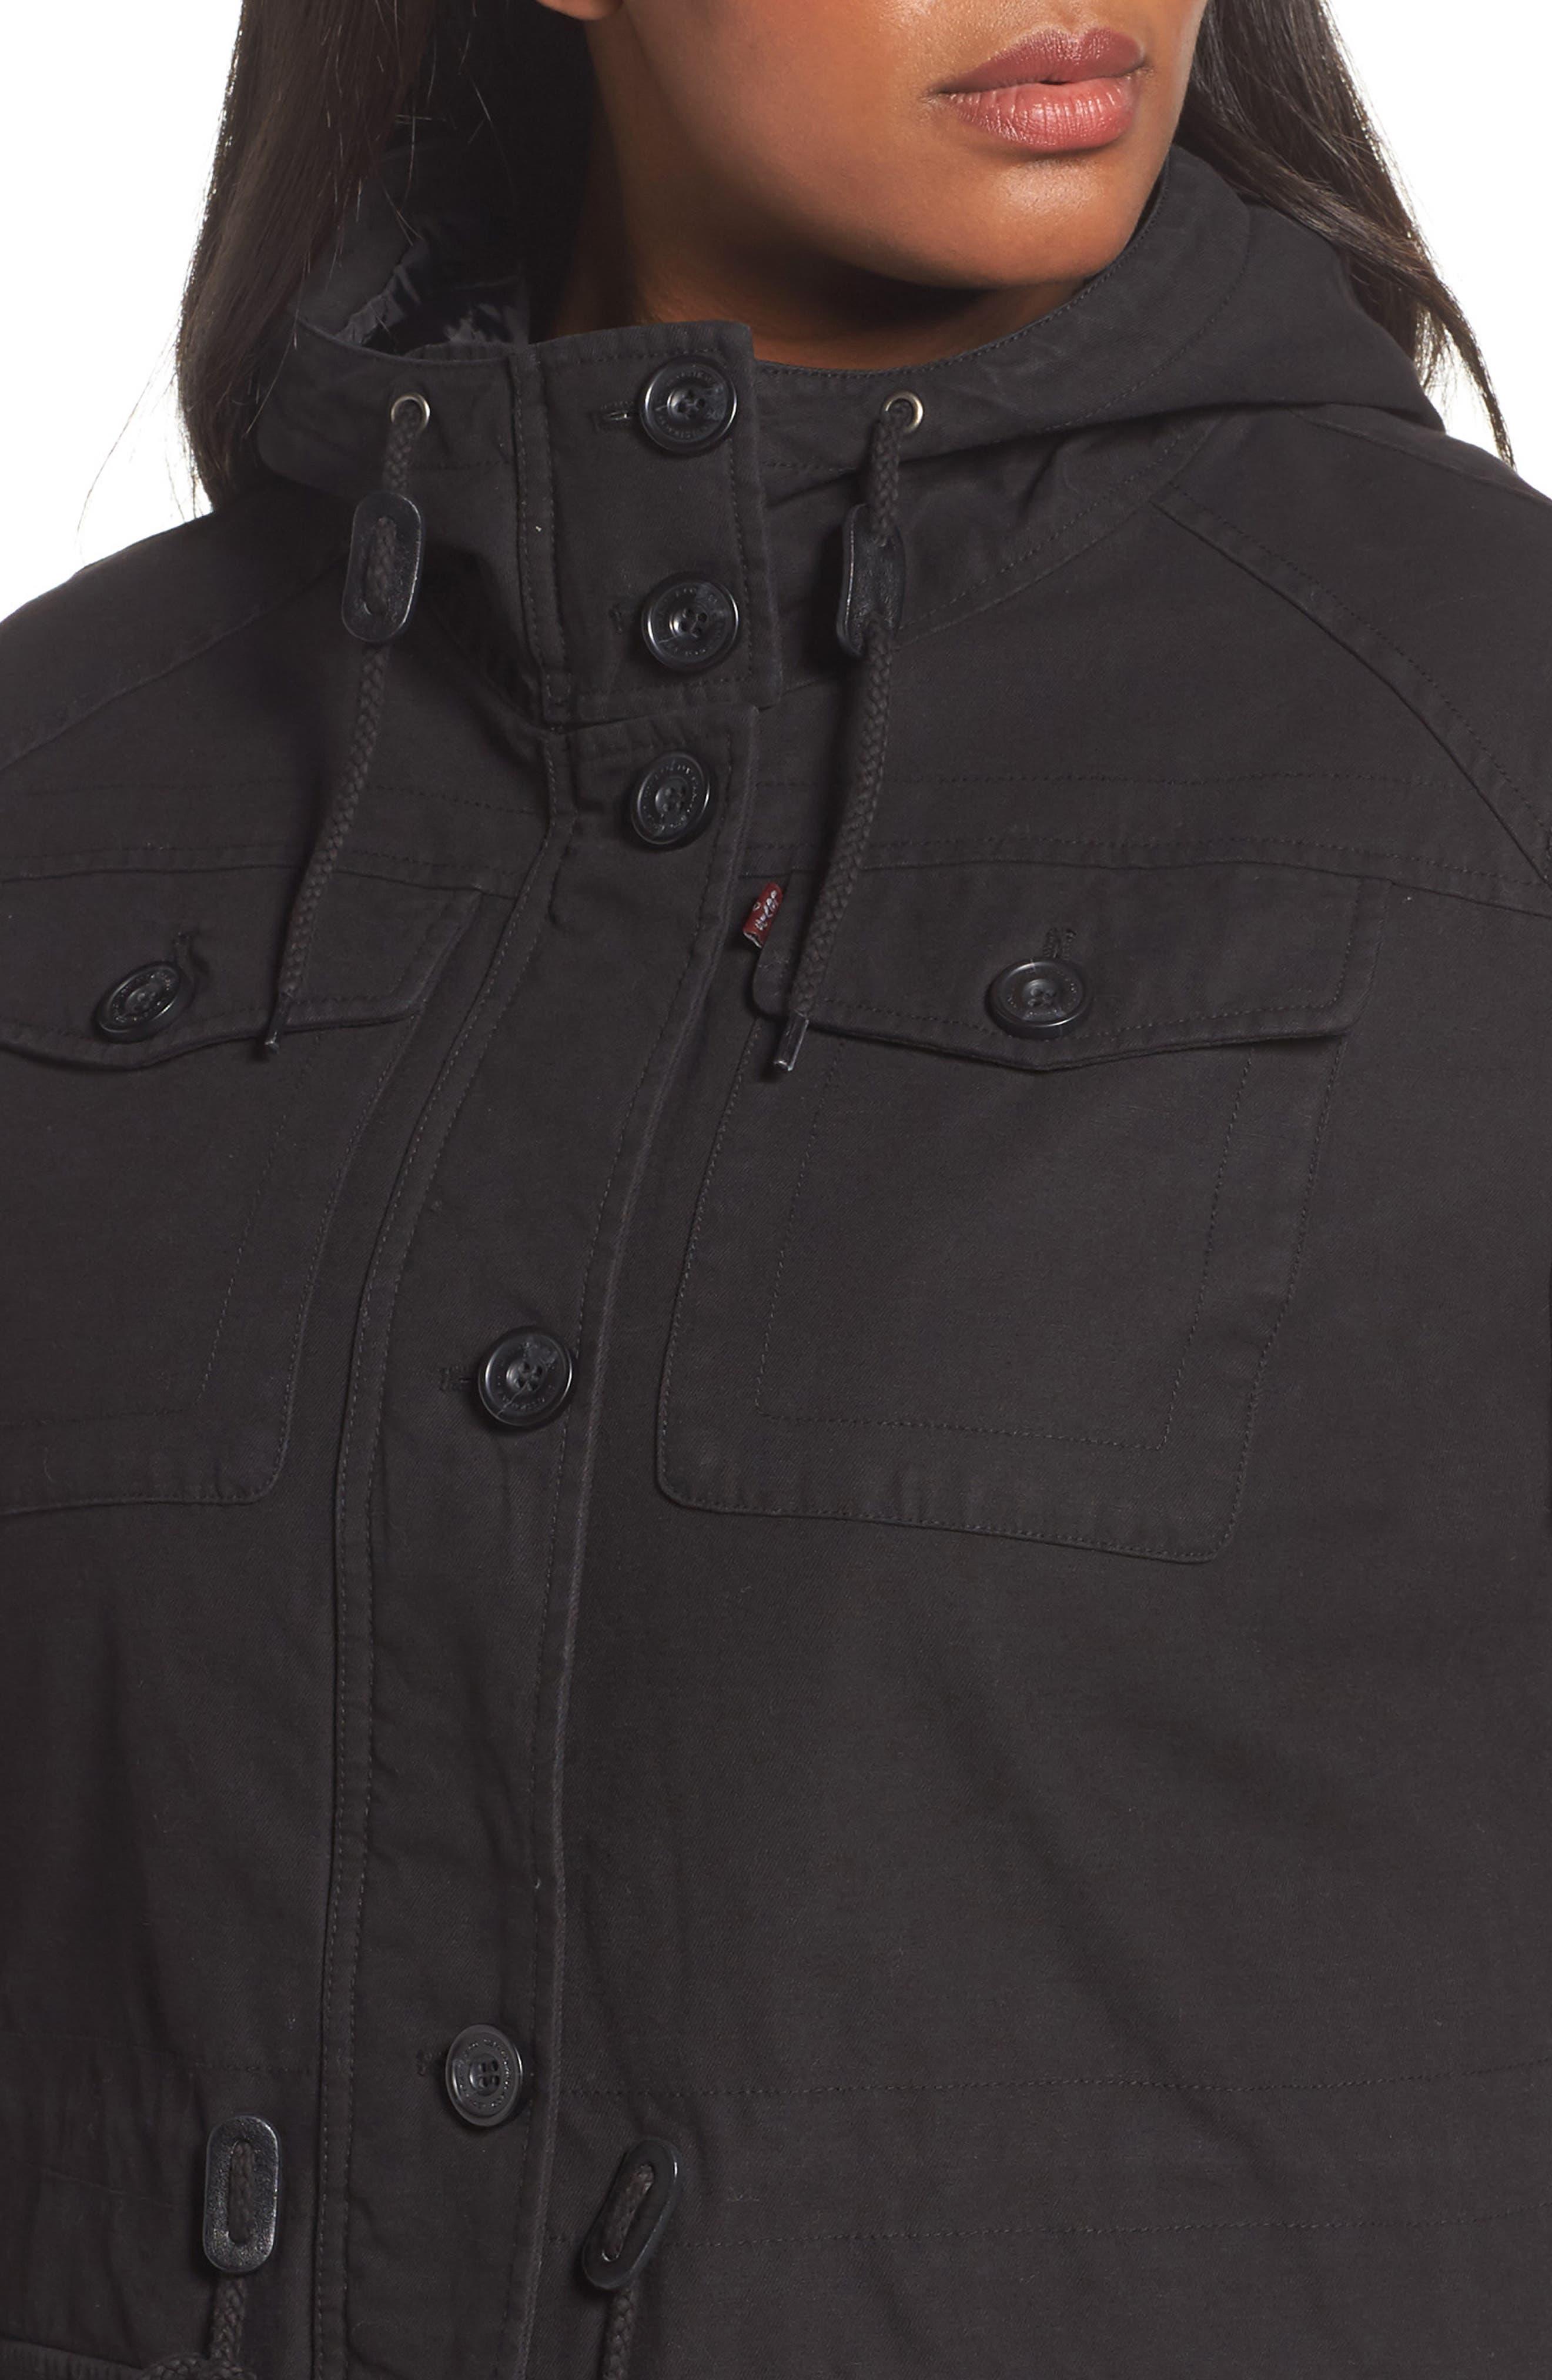 Hooded Cotton Utility Jacket,                             Alternate thumbnail 10, color,